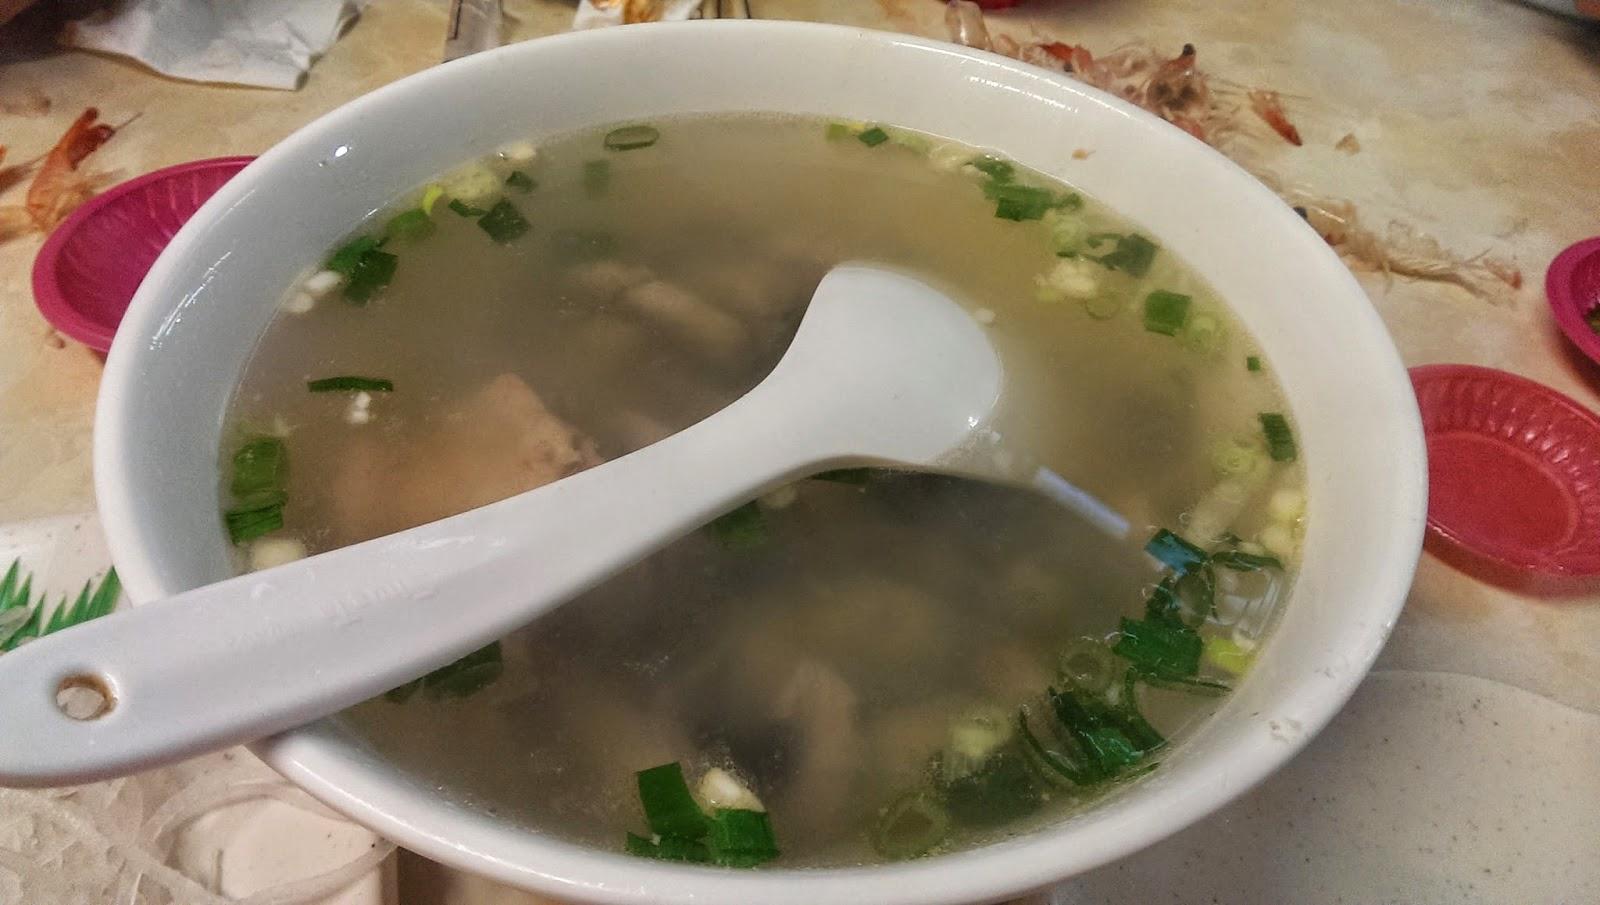 2015 02 02%2B12.19.11 - [食記] 葉家生魚片 - 布袋觀光漁市中的鮮魚餐廳